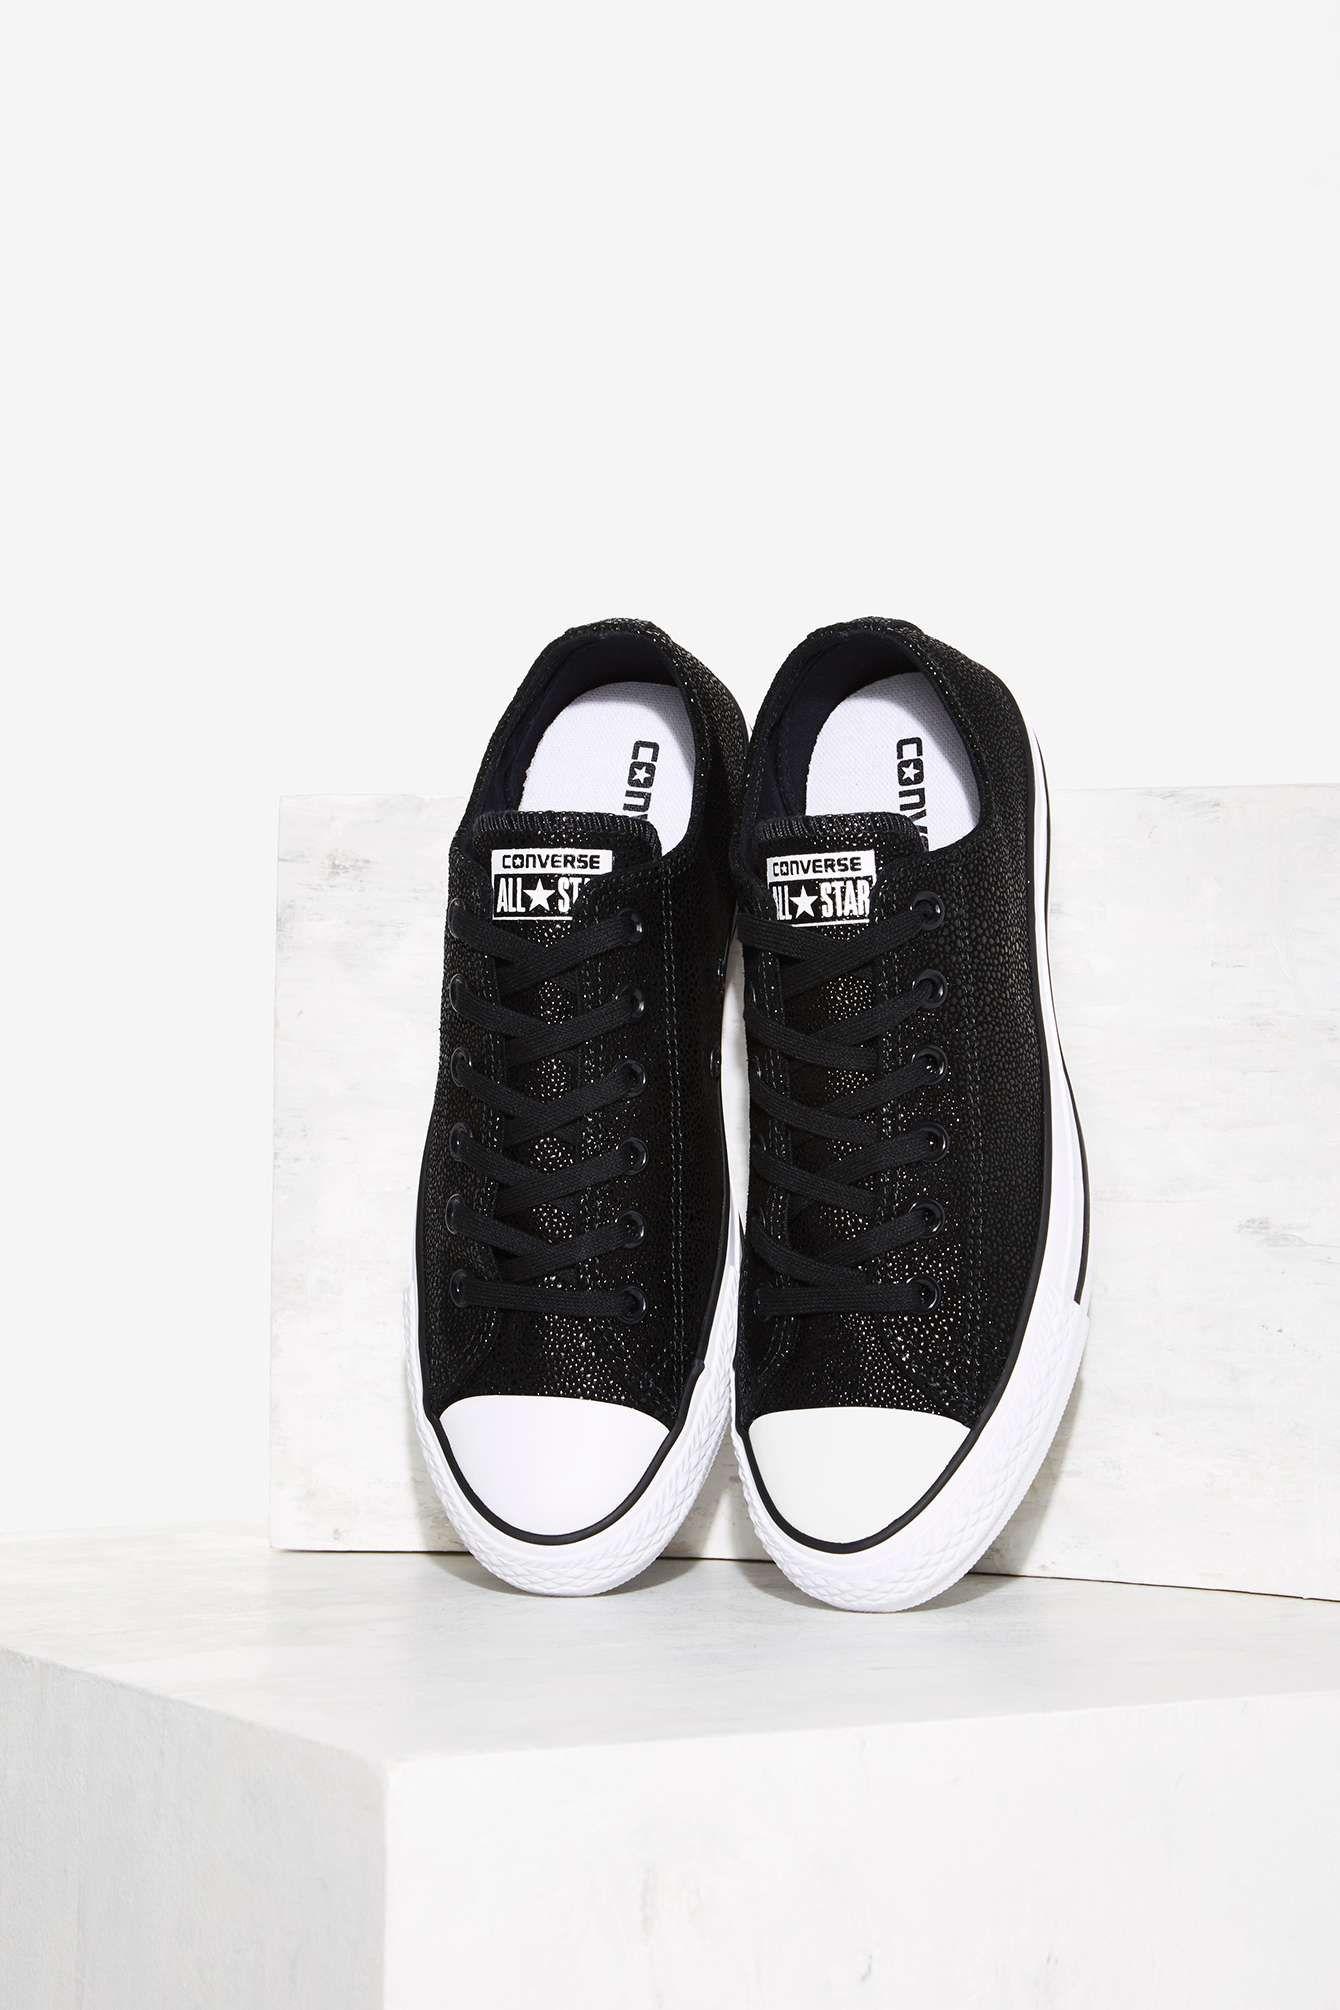 535d699de2dc Converse Chuck Taylor All Star Stingray Leather Sneaker